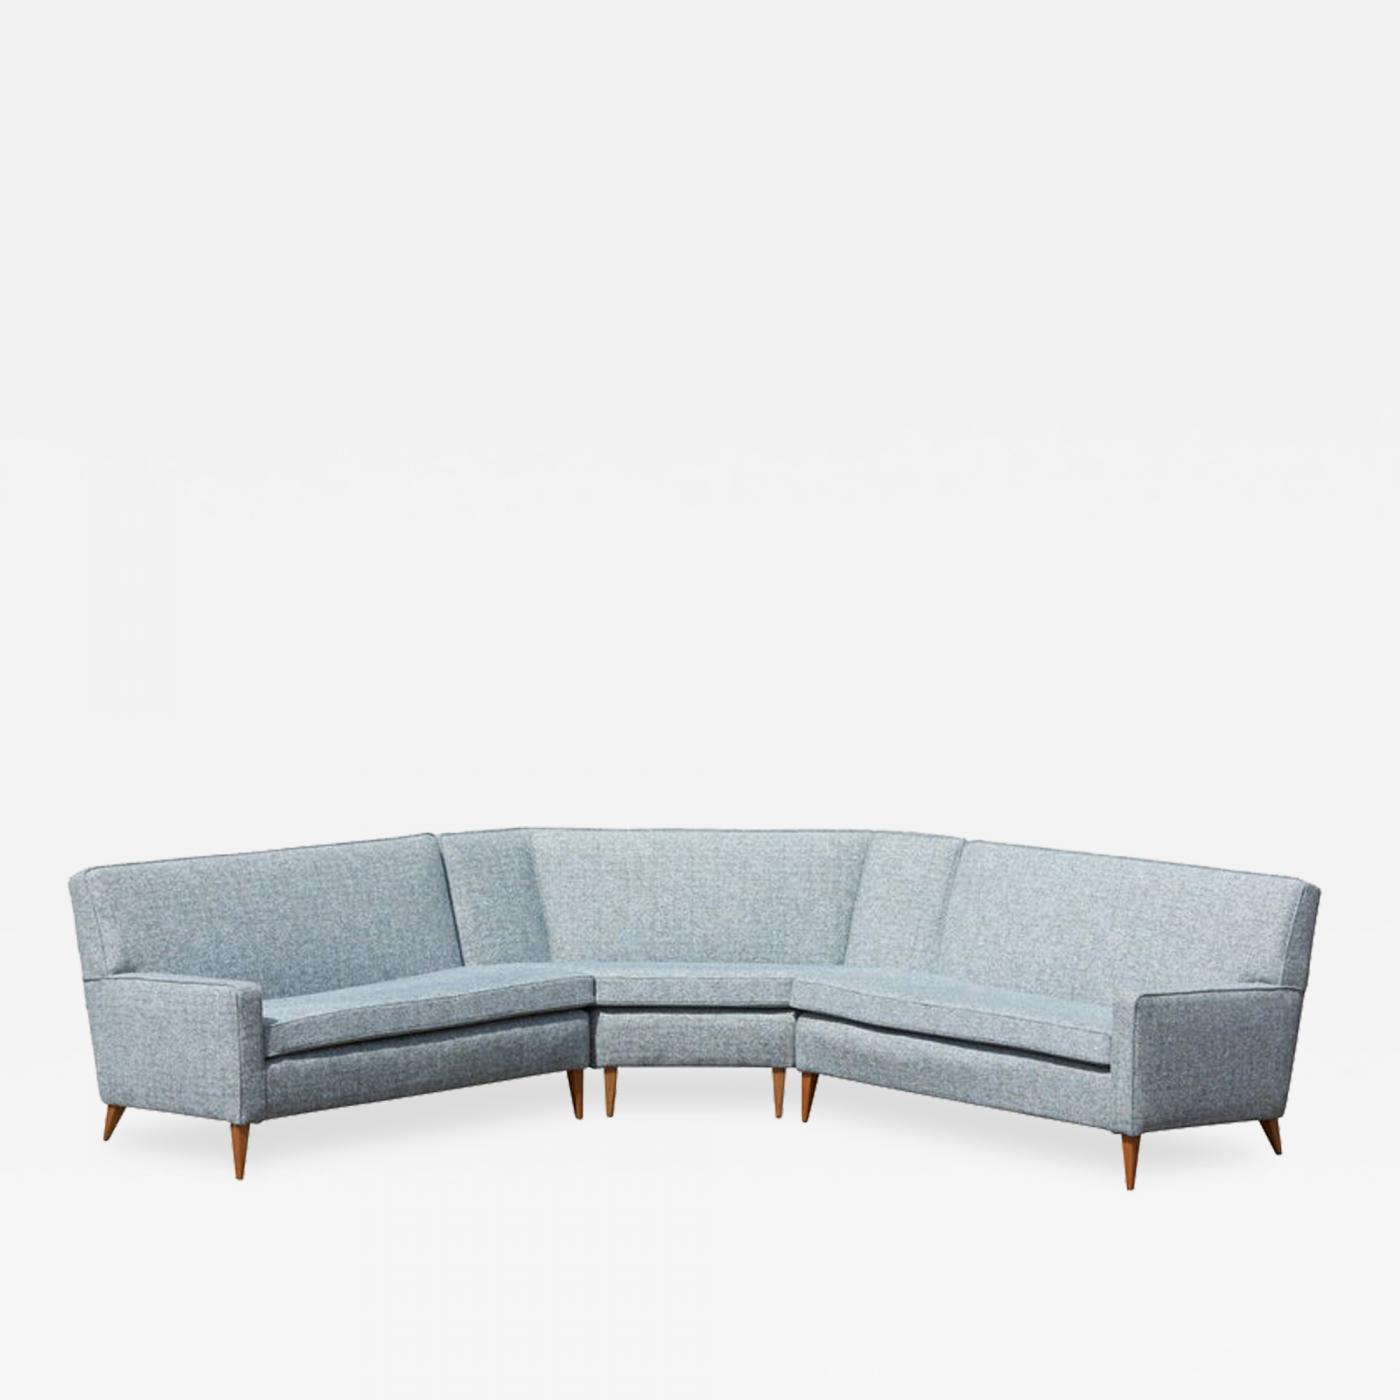 Paul McCobb - Paul McCobb Sectional Corner Sofa Custom Craft/ Planner Group  Newly Upholstered